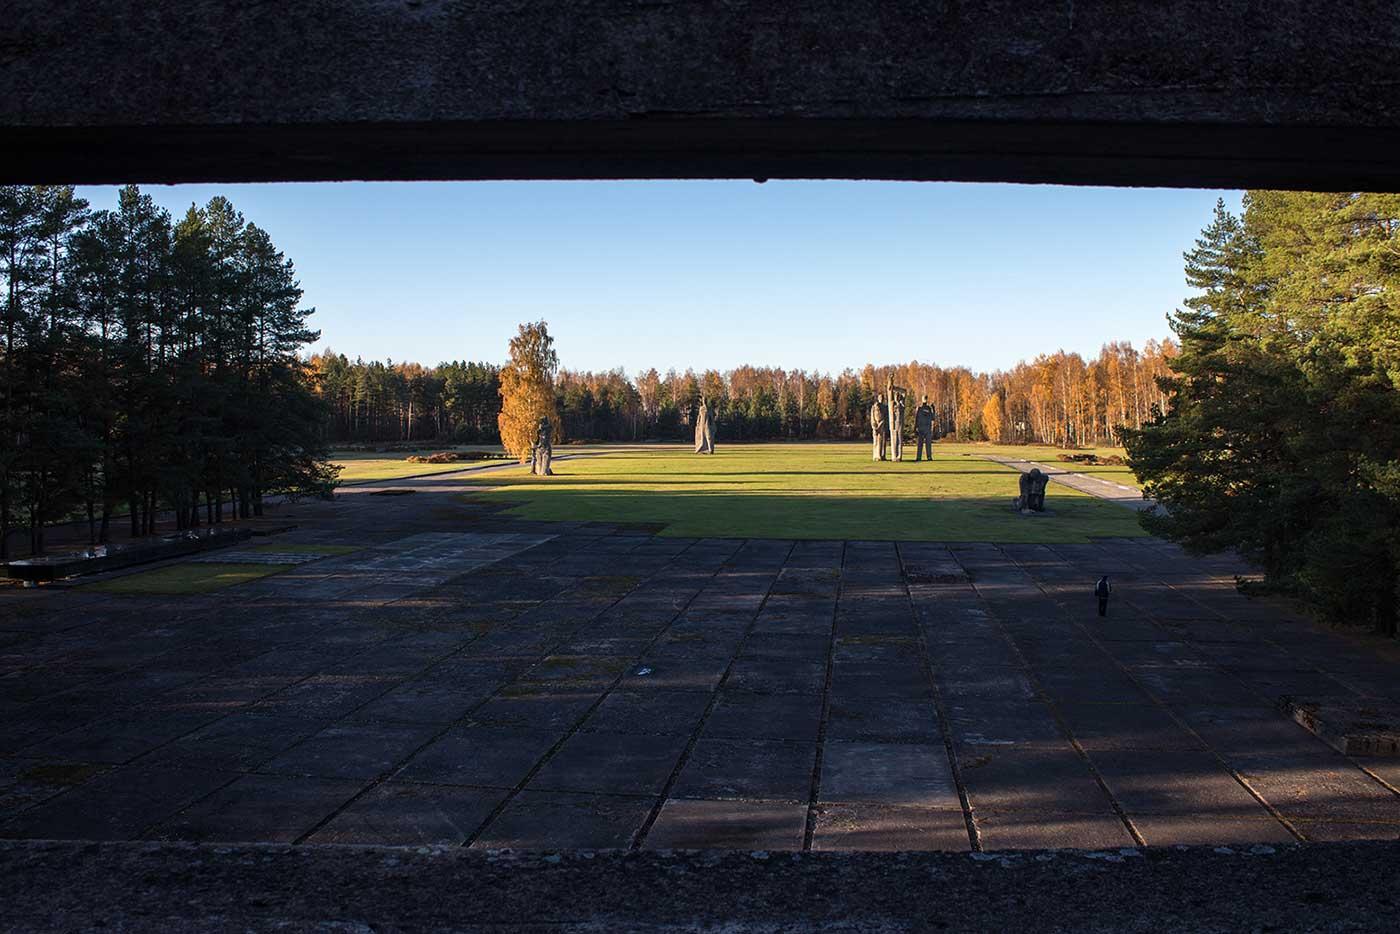 The Salaspils Memorial Ensemble, seen from the gallery. Salaspils Memorial, Latvia.